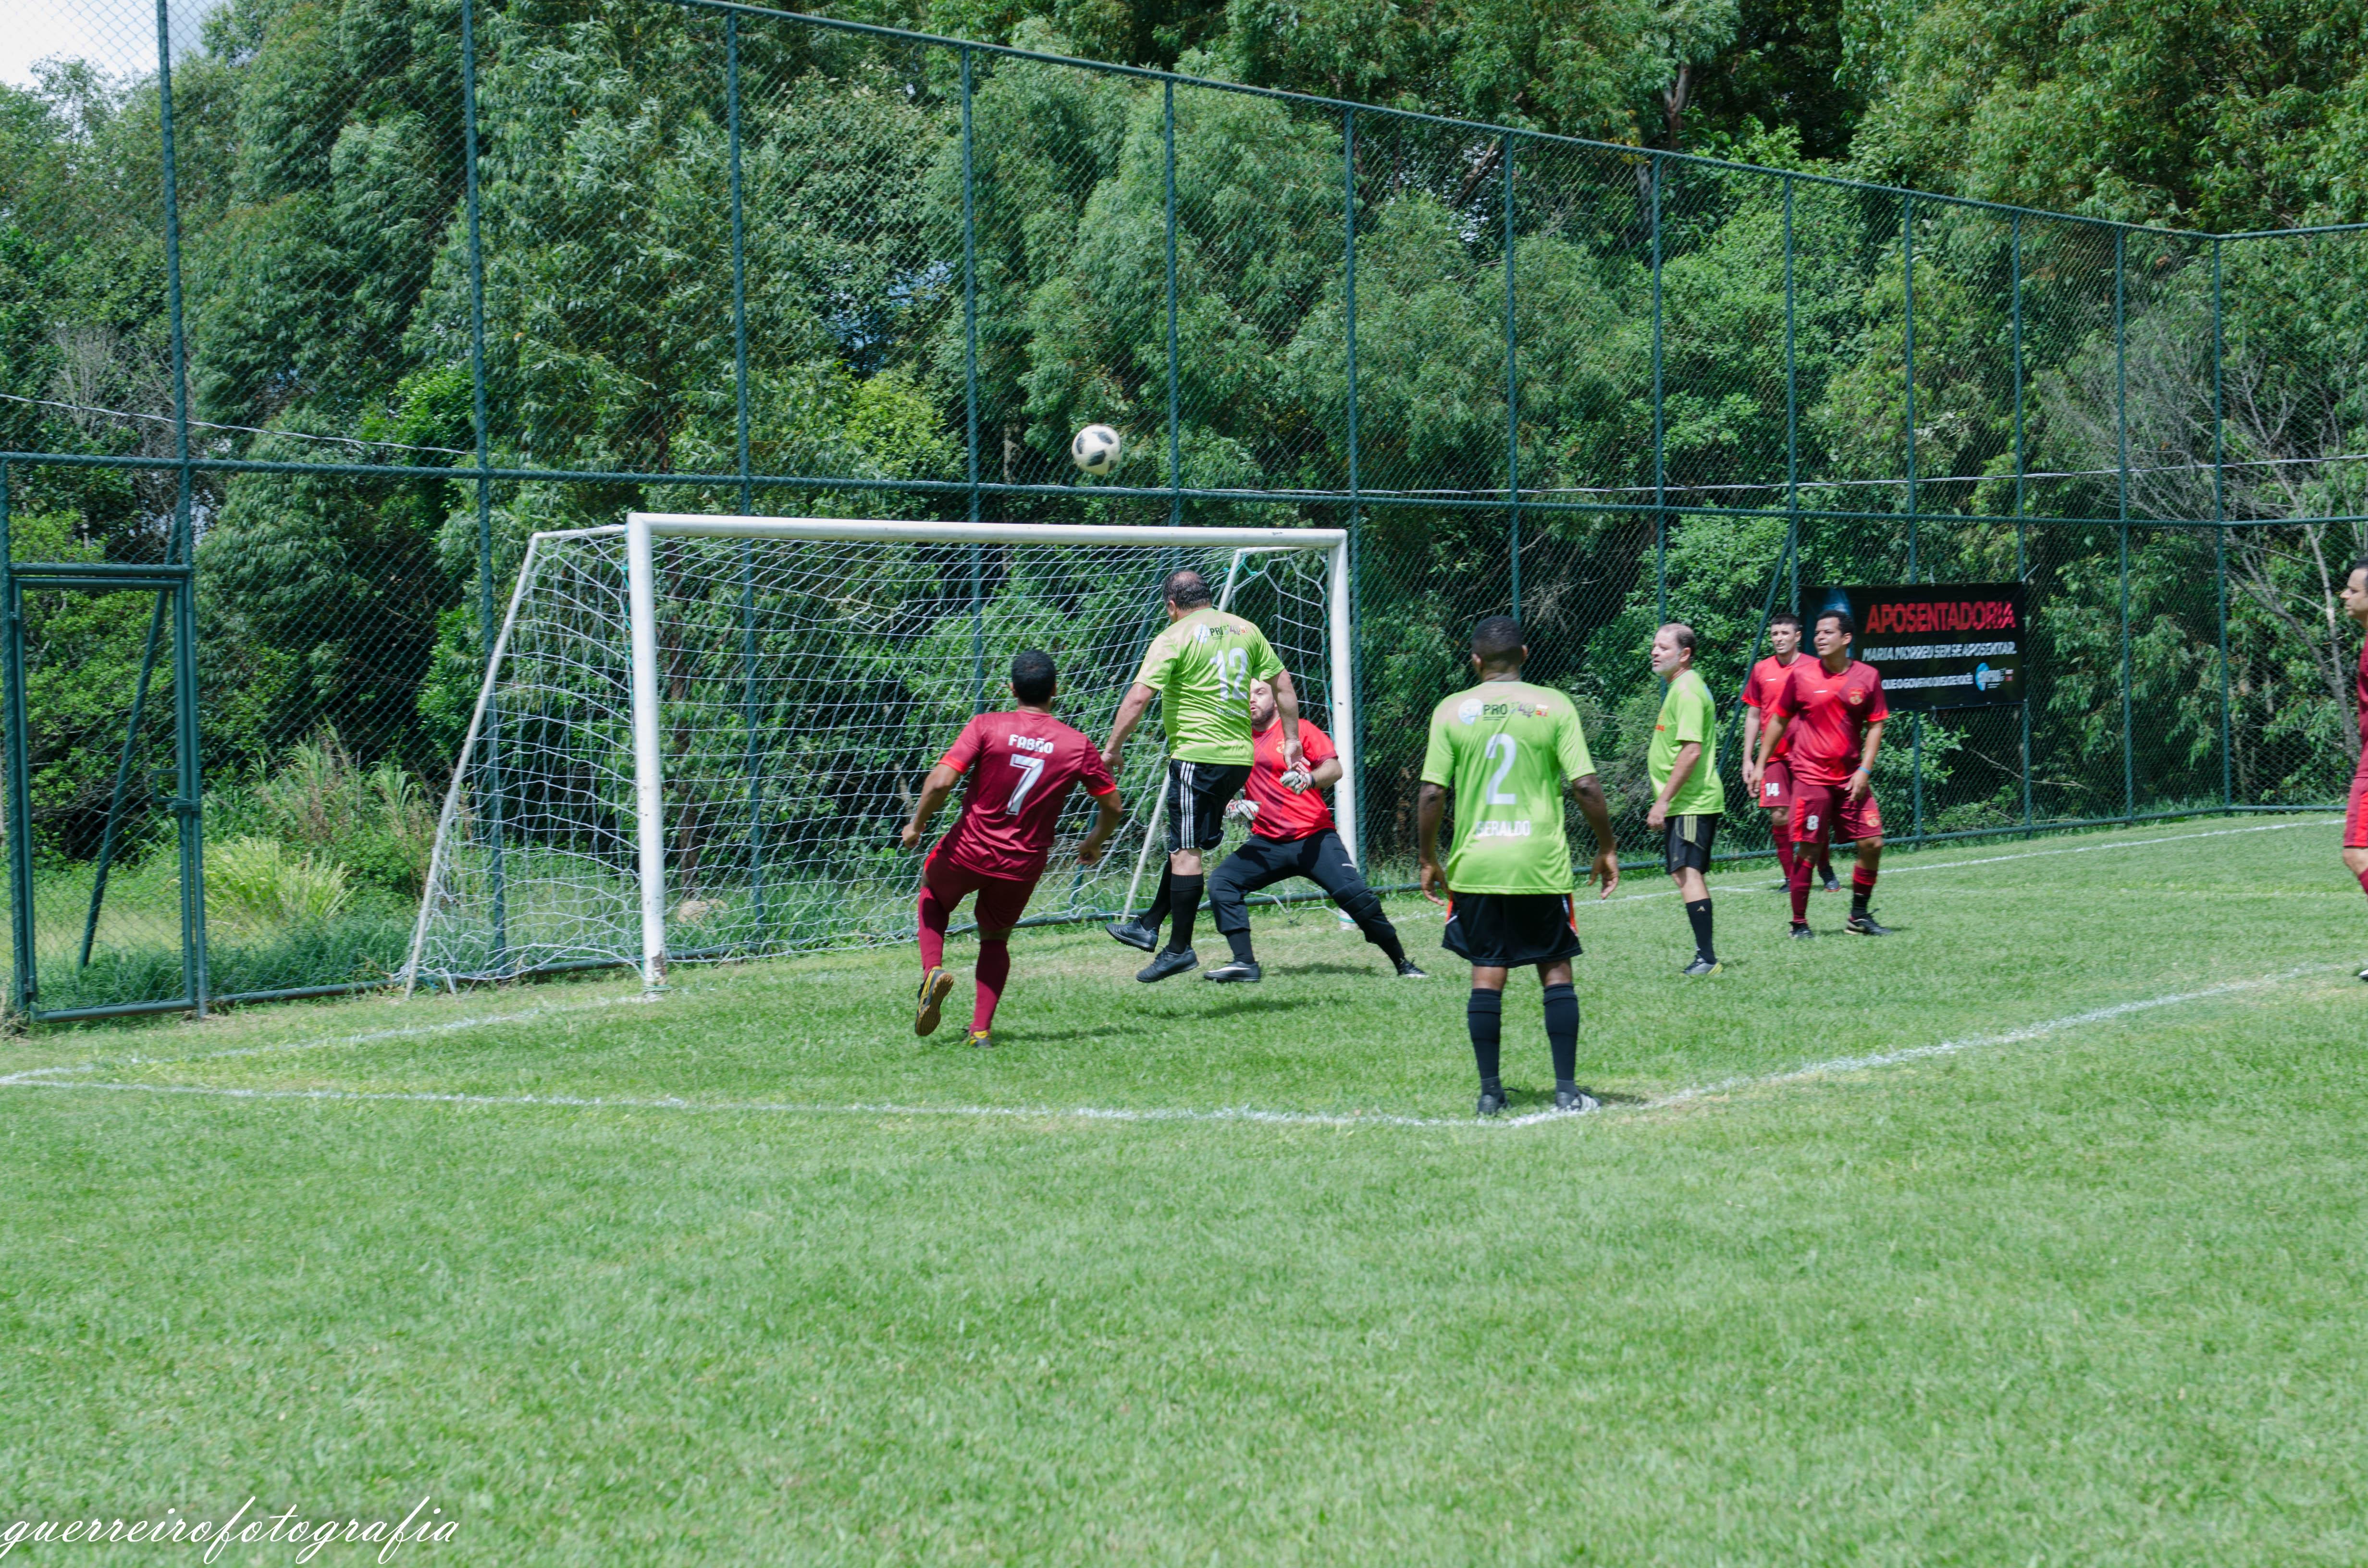 Sinpro – Finais do campeonato de futebol